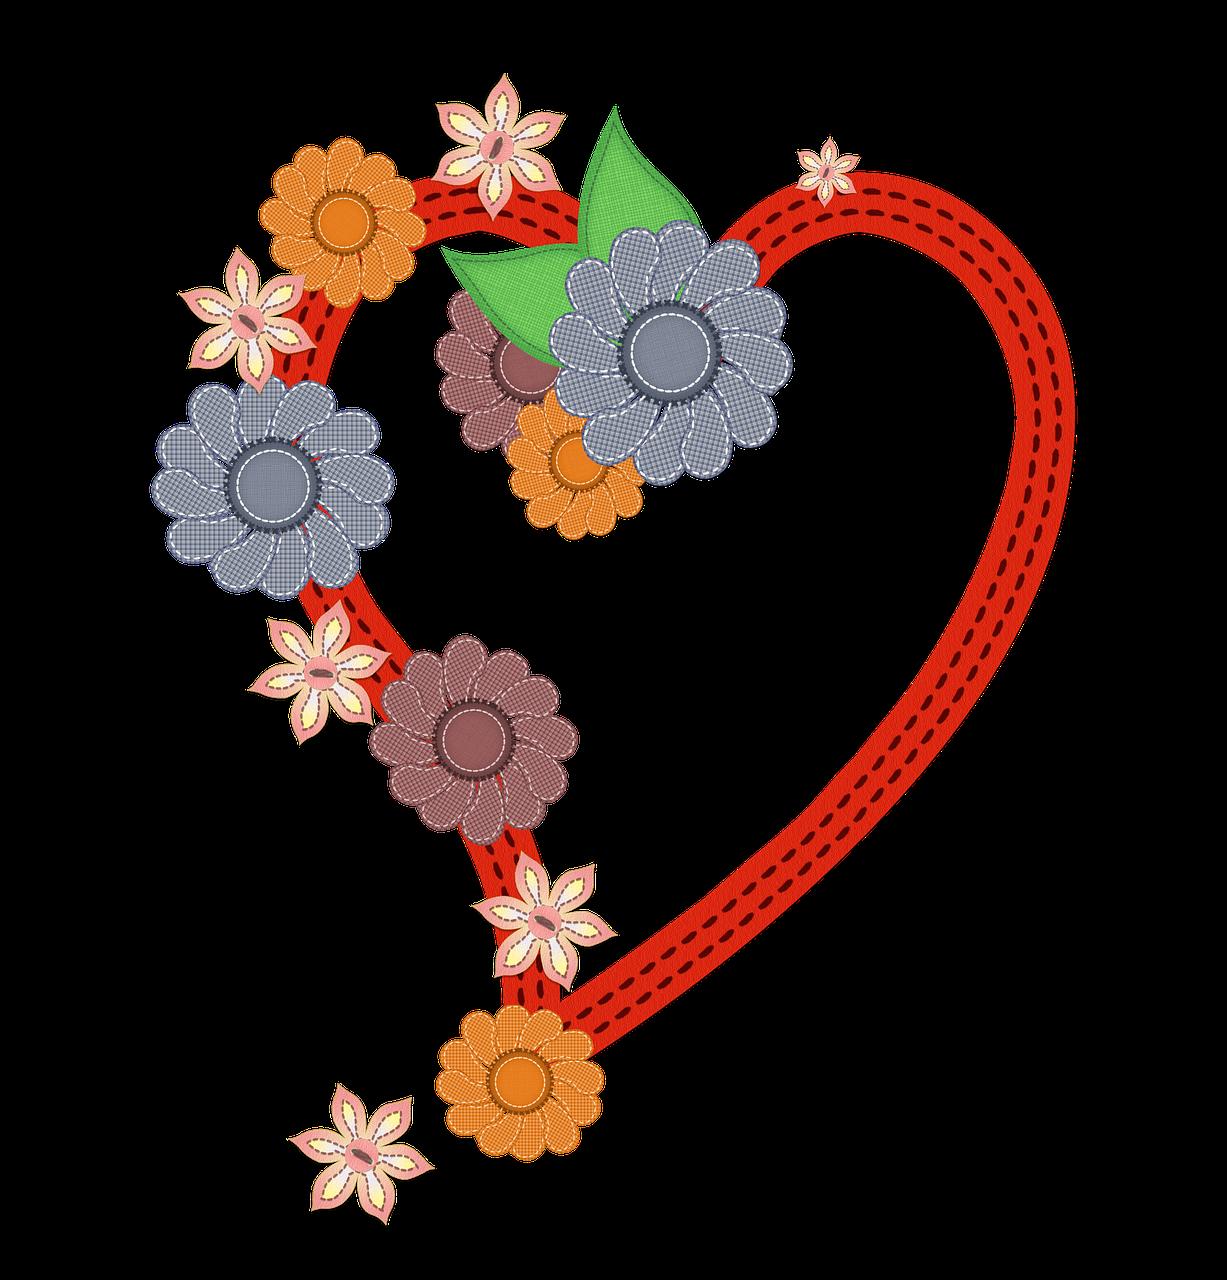 valentines-day-2053070_1280